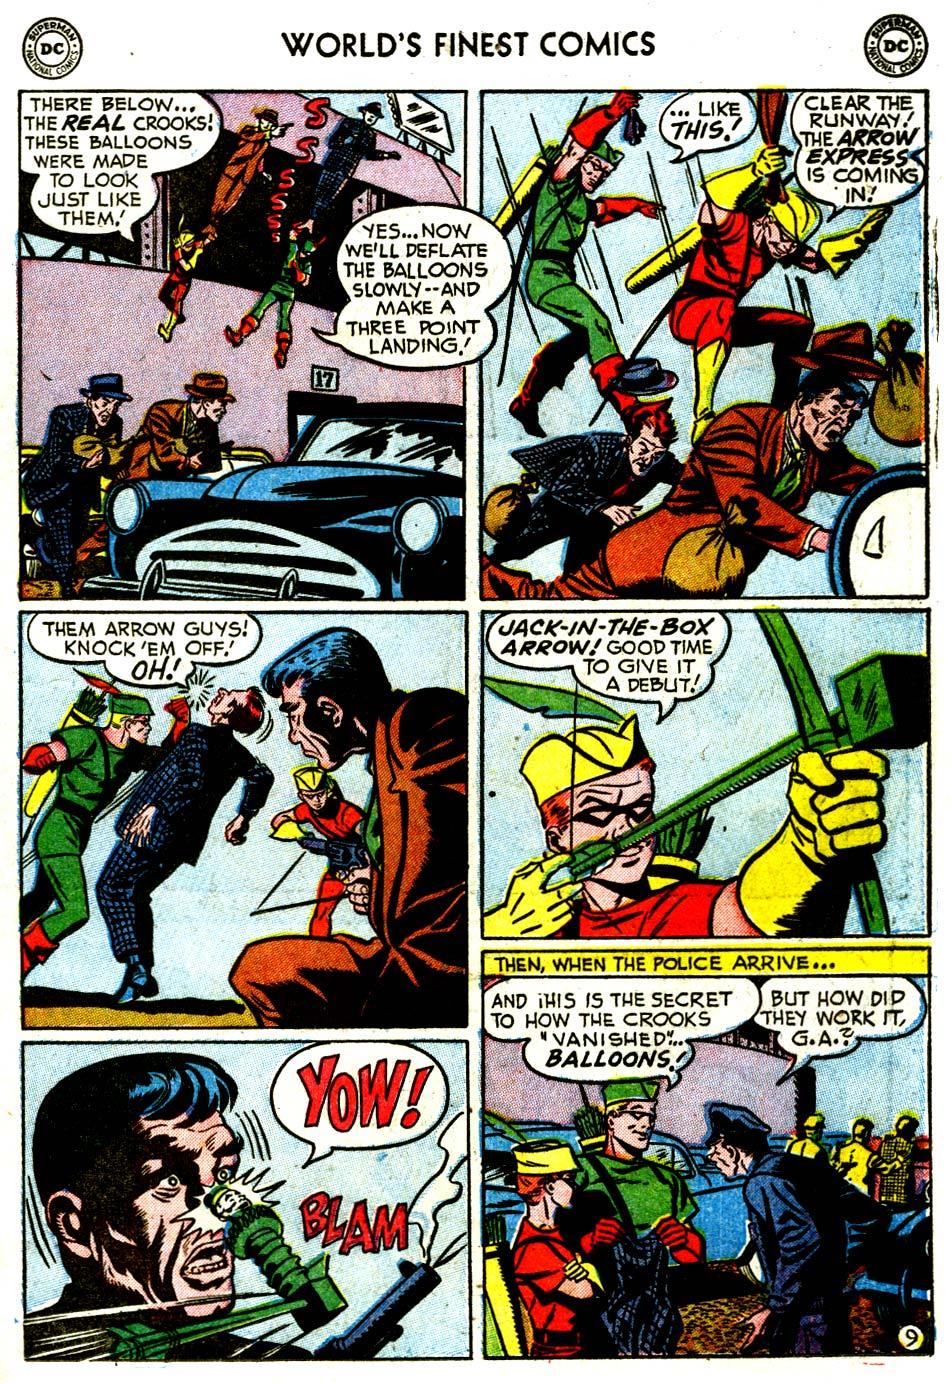 Read online World's Finest Comics comic -  Issue #68 - 35